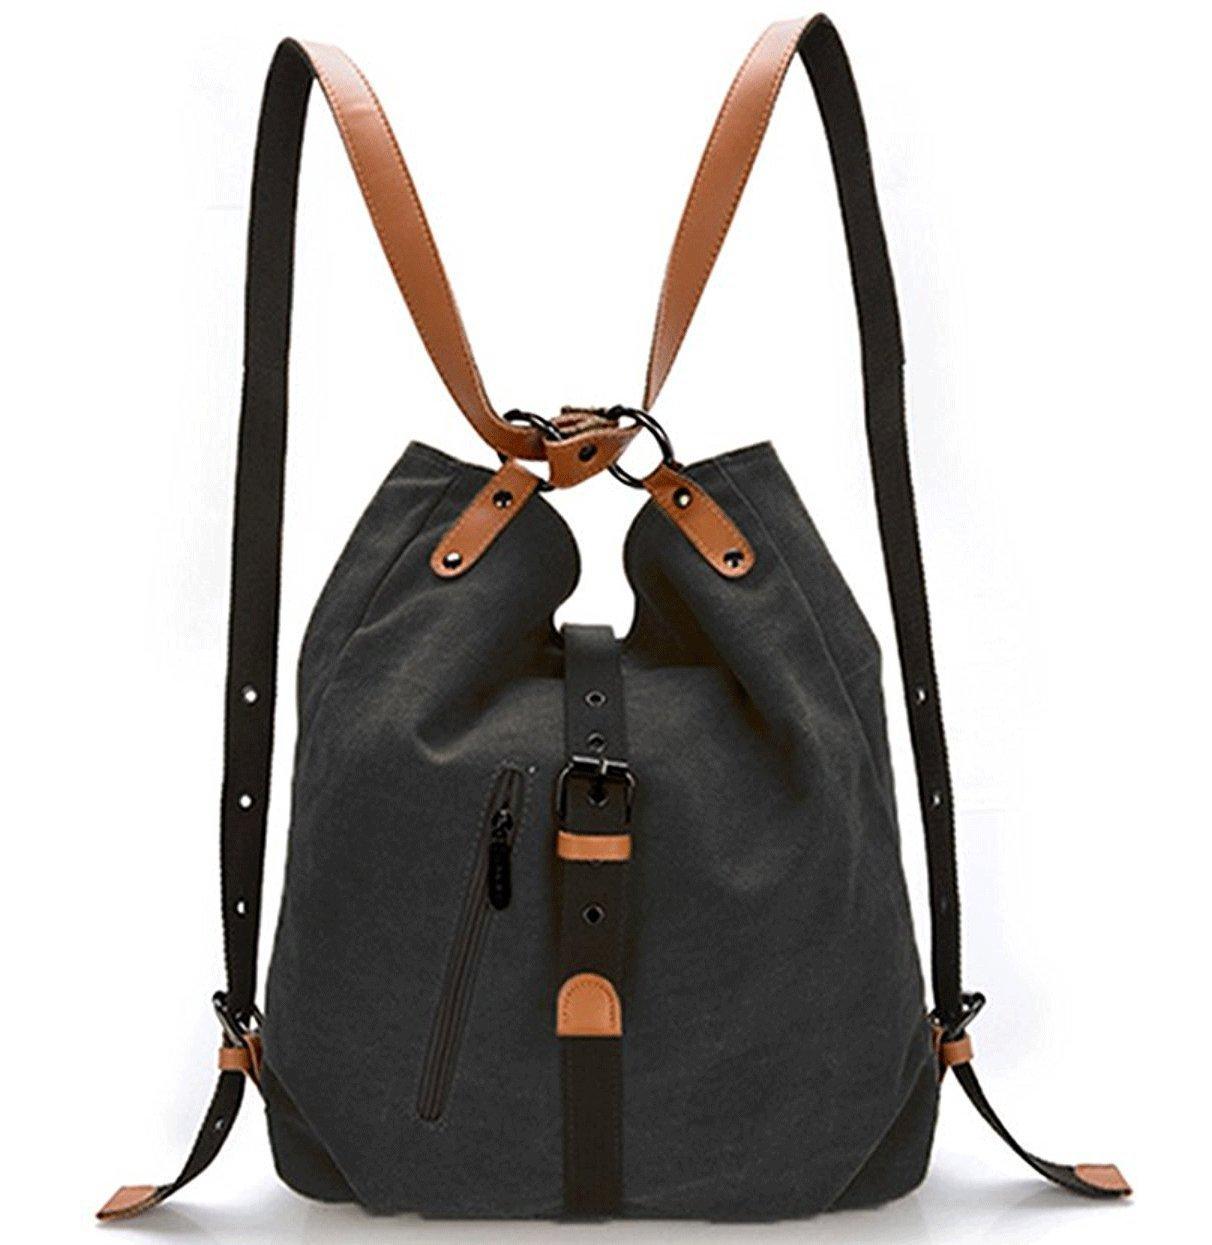 Women Shoulder Bag Ladies Fashion Backpack Purse Multifunctional Casual Backpack Canvas Handbags Blue